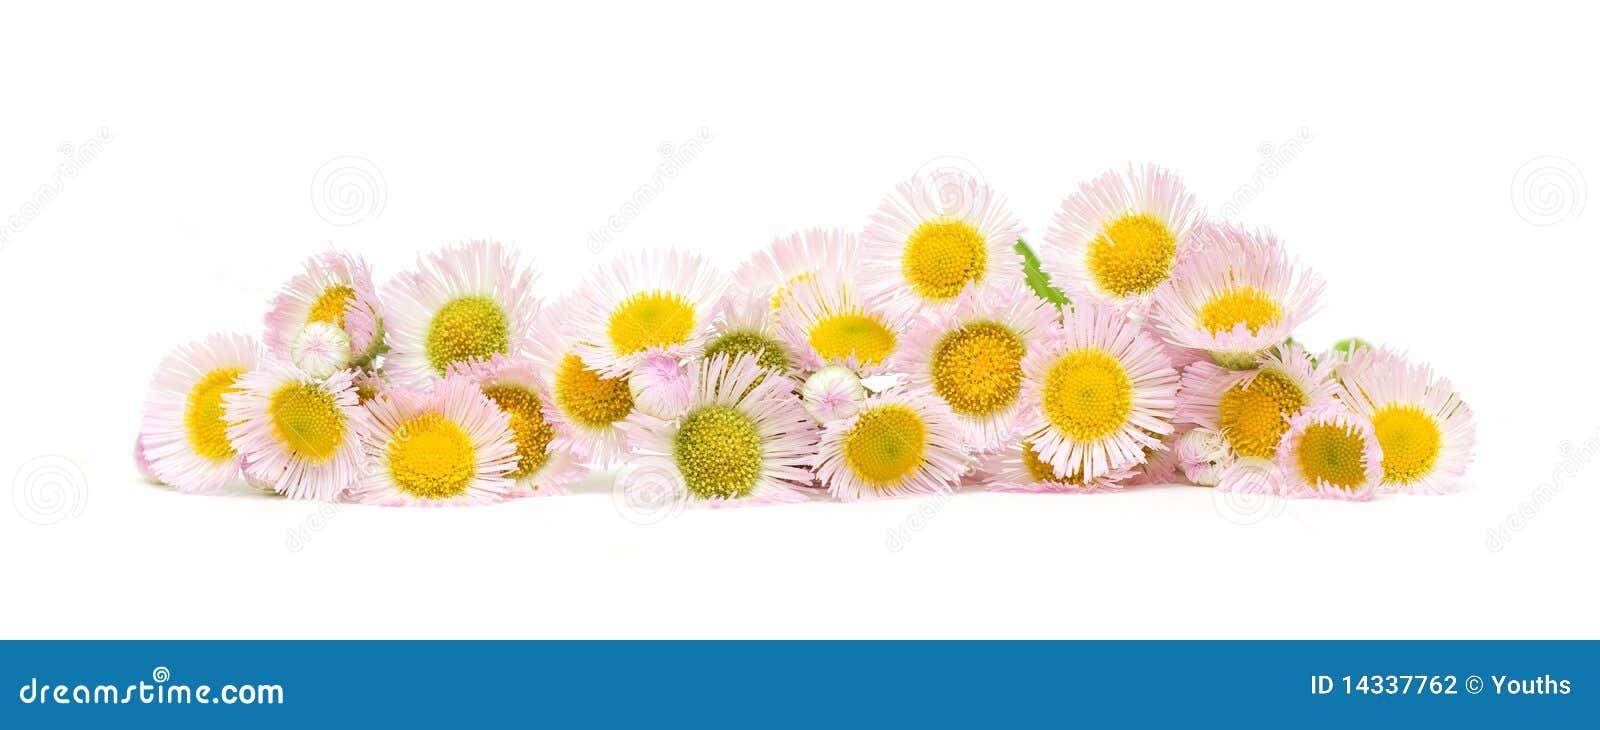 Fleurs de chrysanthemum